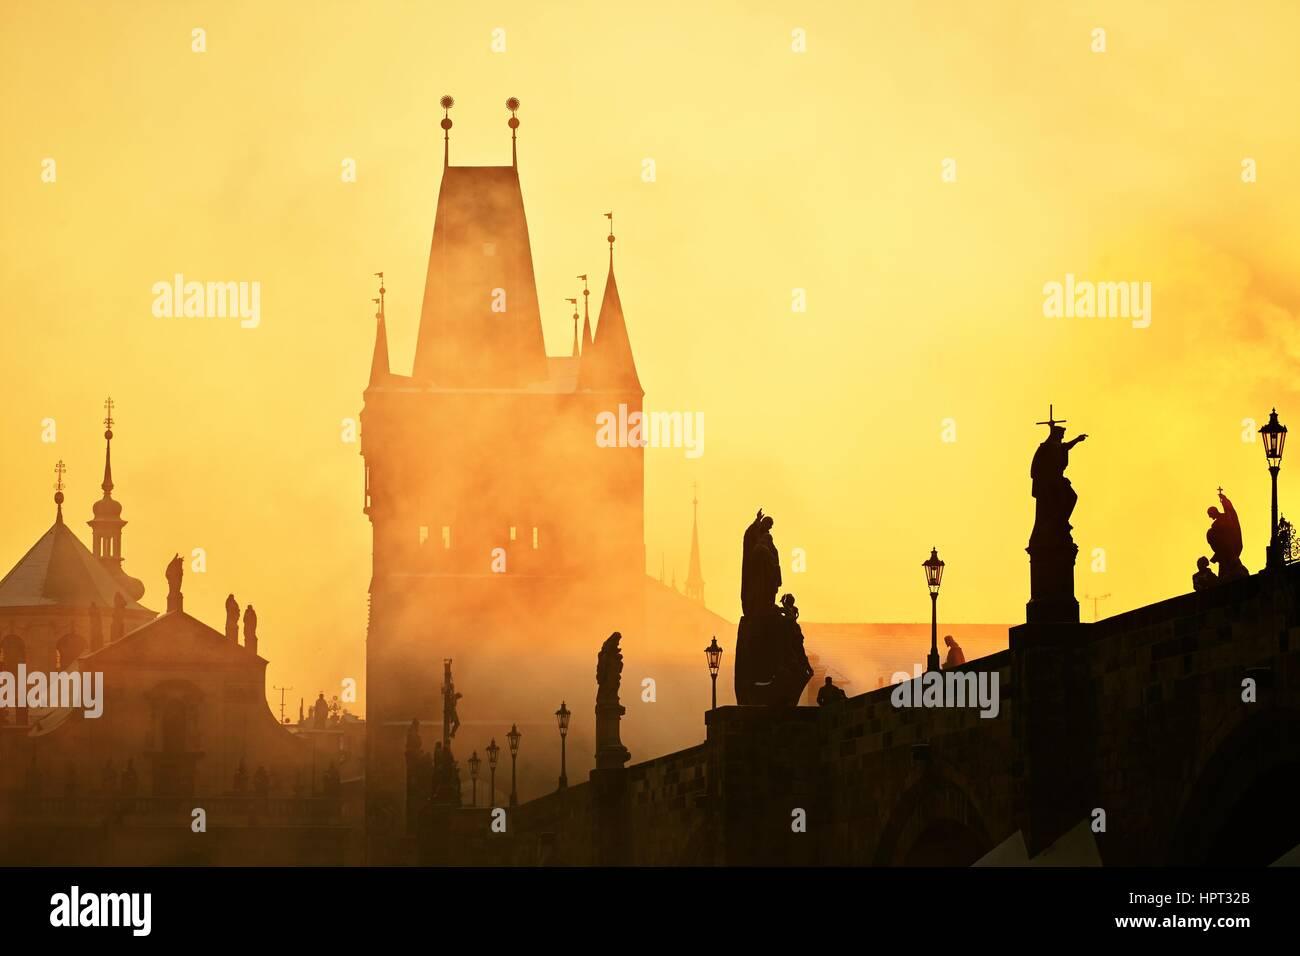 Mysterium Nebel bei Sonnenaufgang. Karlsbrücke in Prag, Tschechien. Stockbild